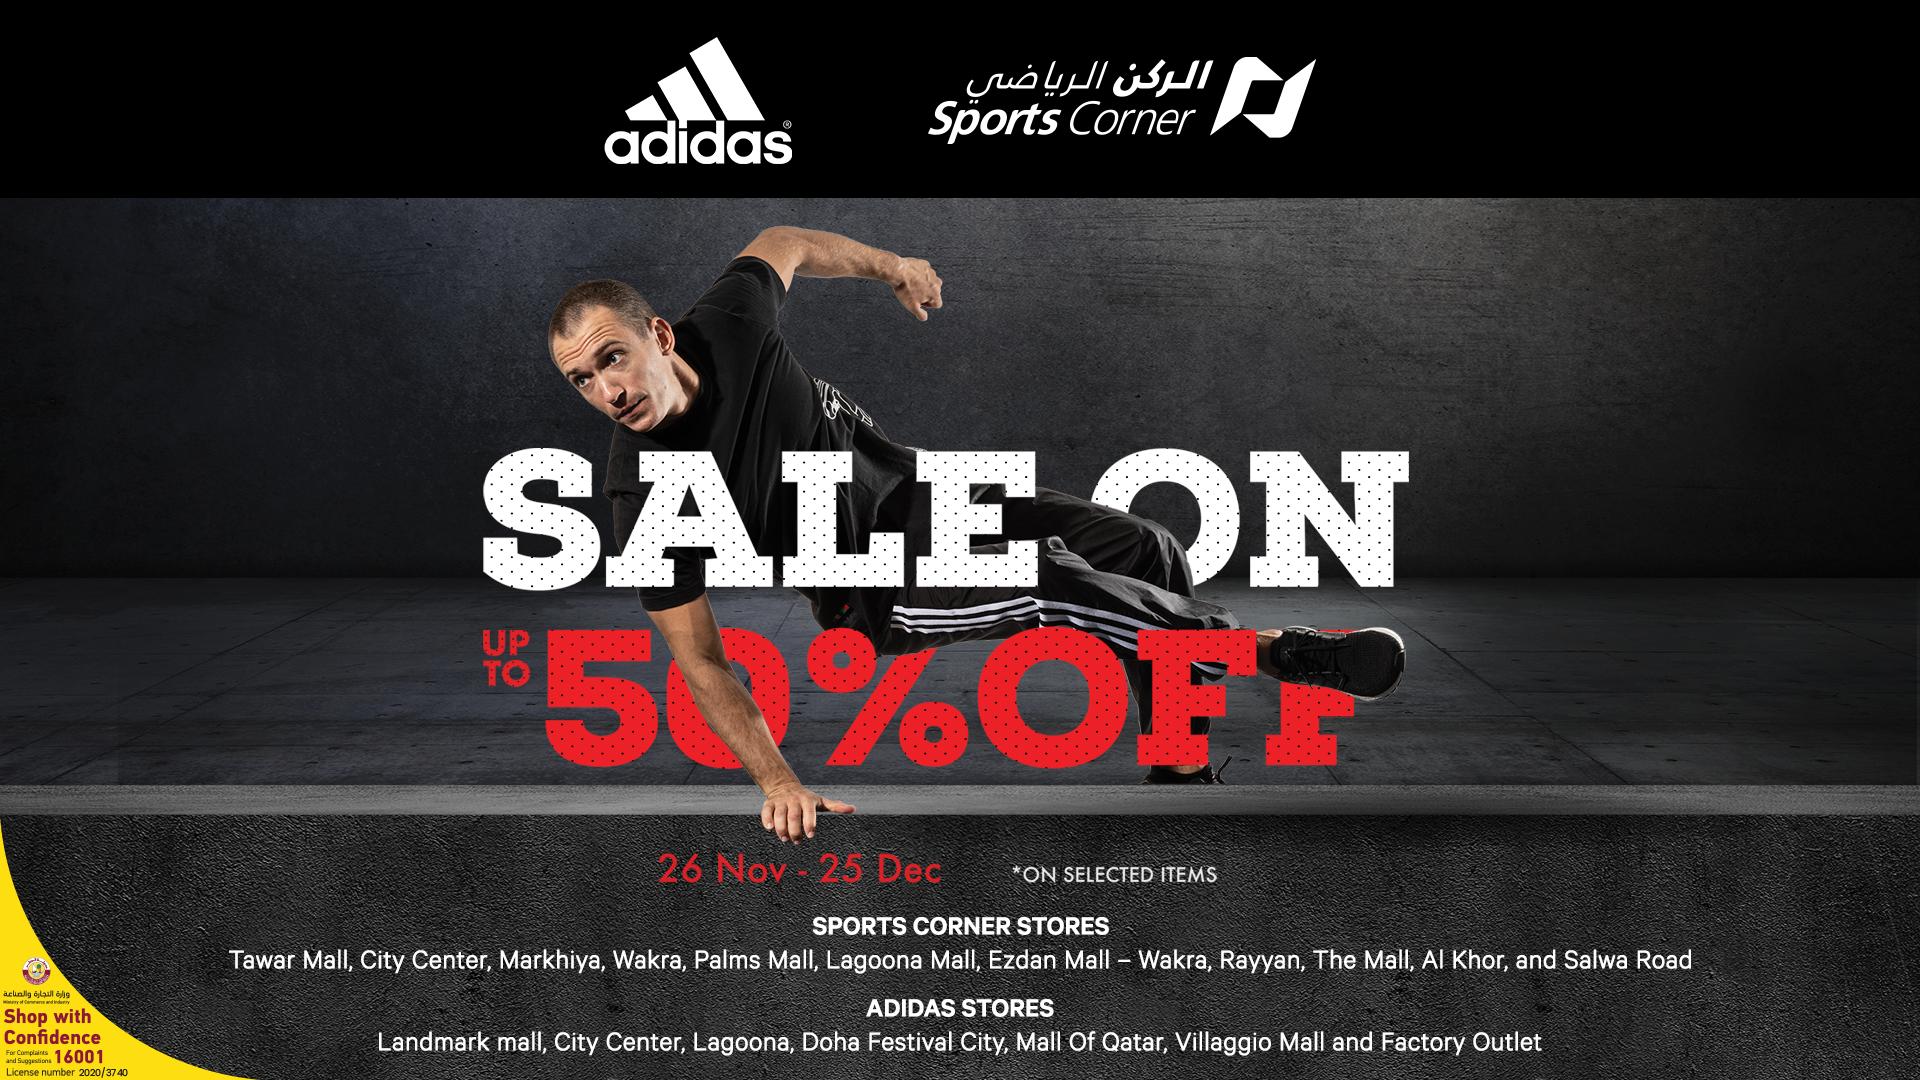 Sports Corner & Adidas Winter Sale is BACK!